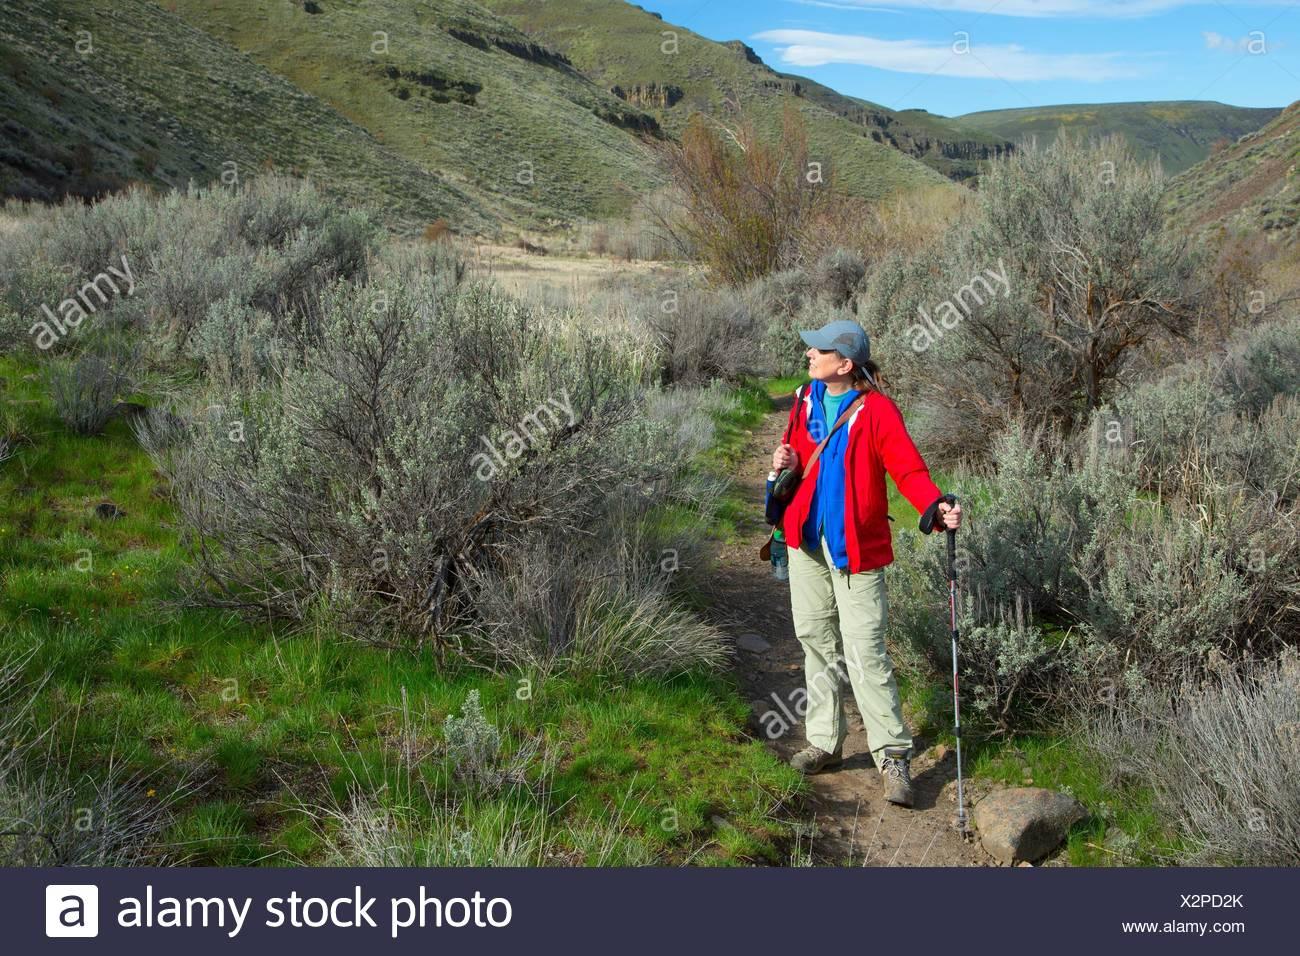 Umtanum Creek Trail, Yakima River Canyon Scenic e di attività ricreative autostrada, Wenas membro Area faunistica, Washington. Immagini Stock